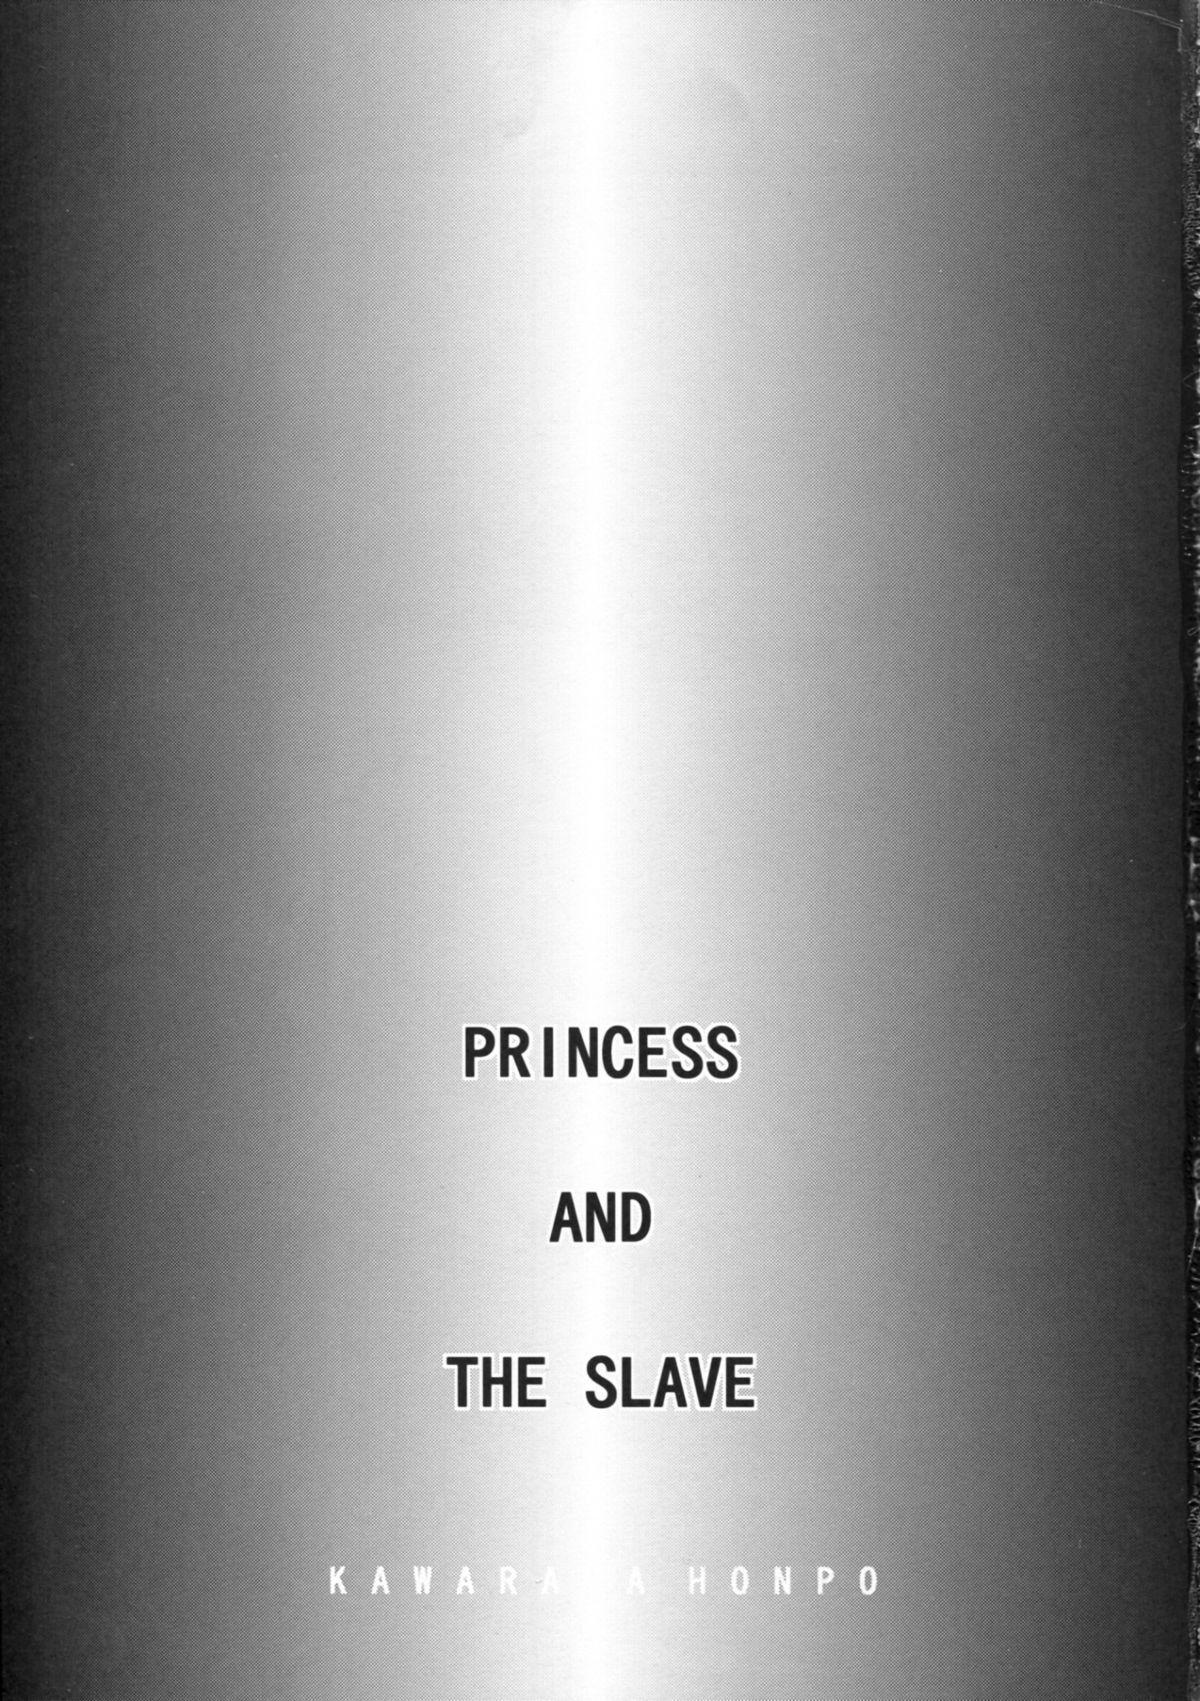 PRINCESS AND THE SLAVE 1